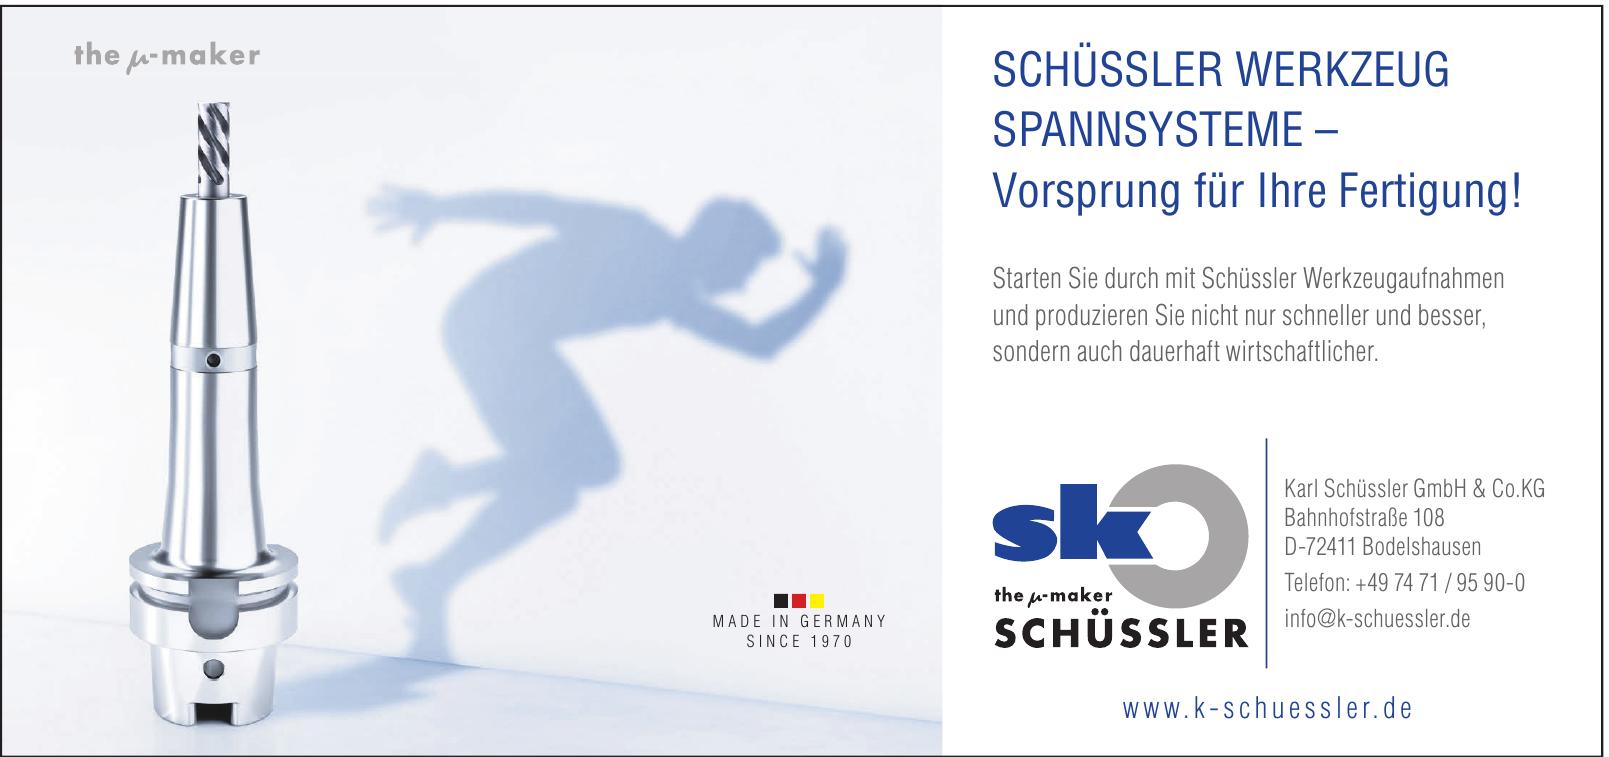 Karl Schüssler GbmH & Co. KG